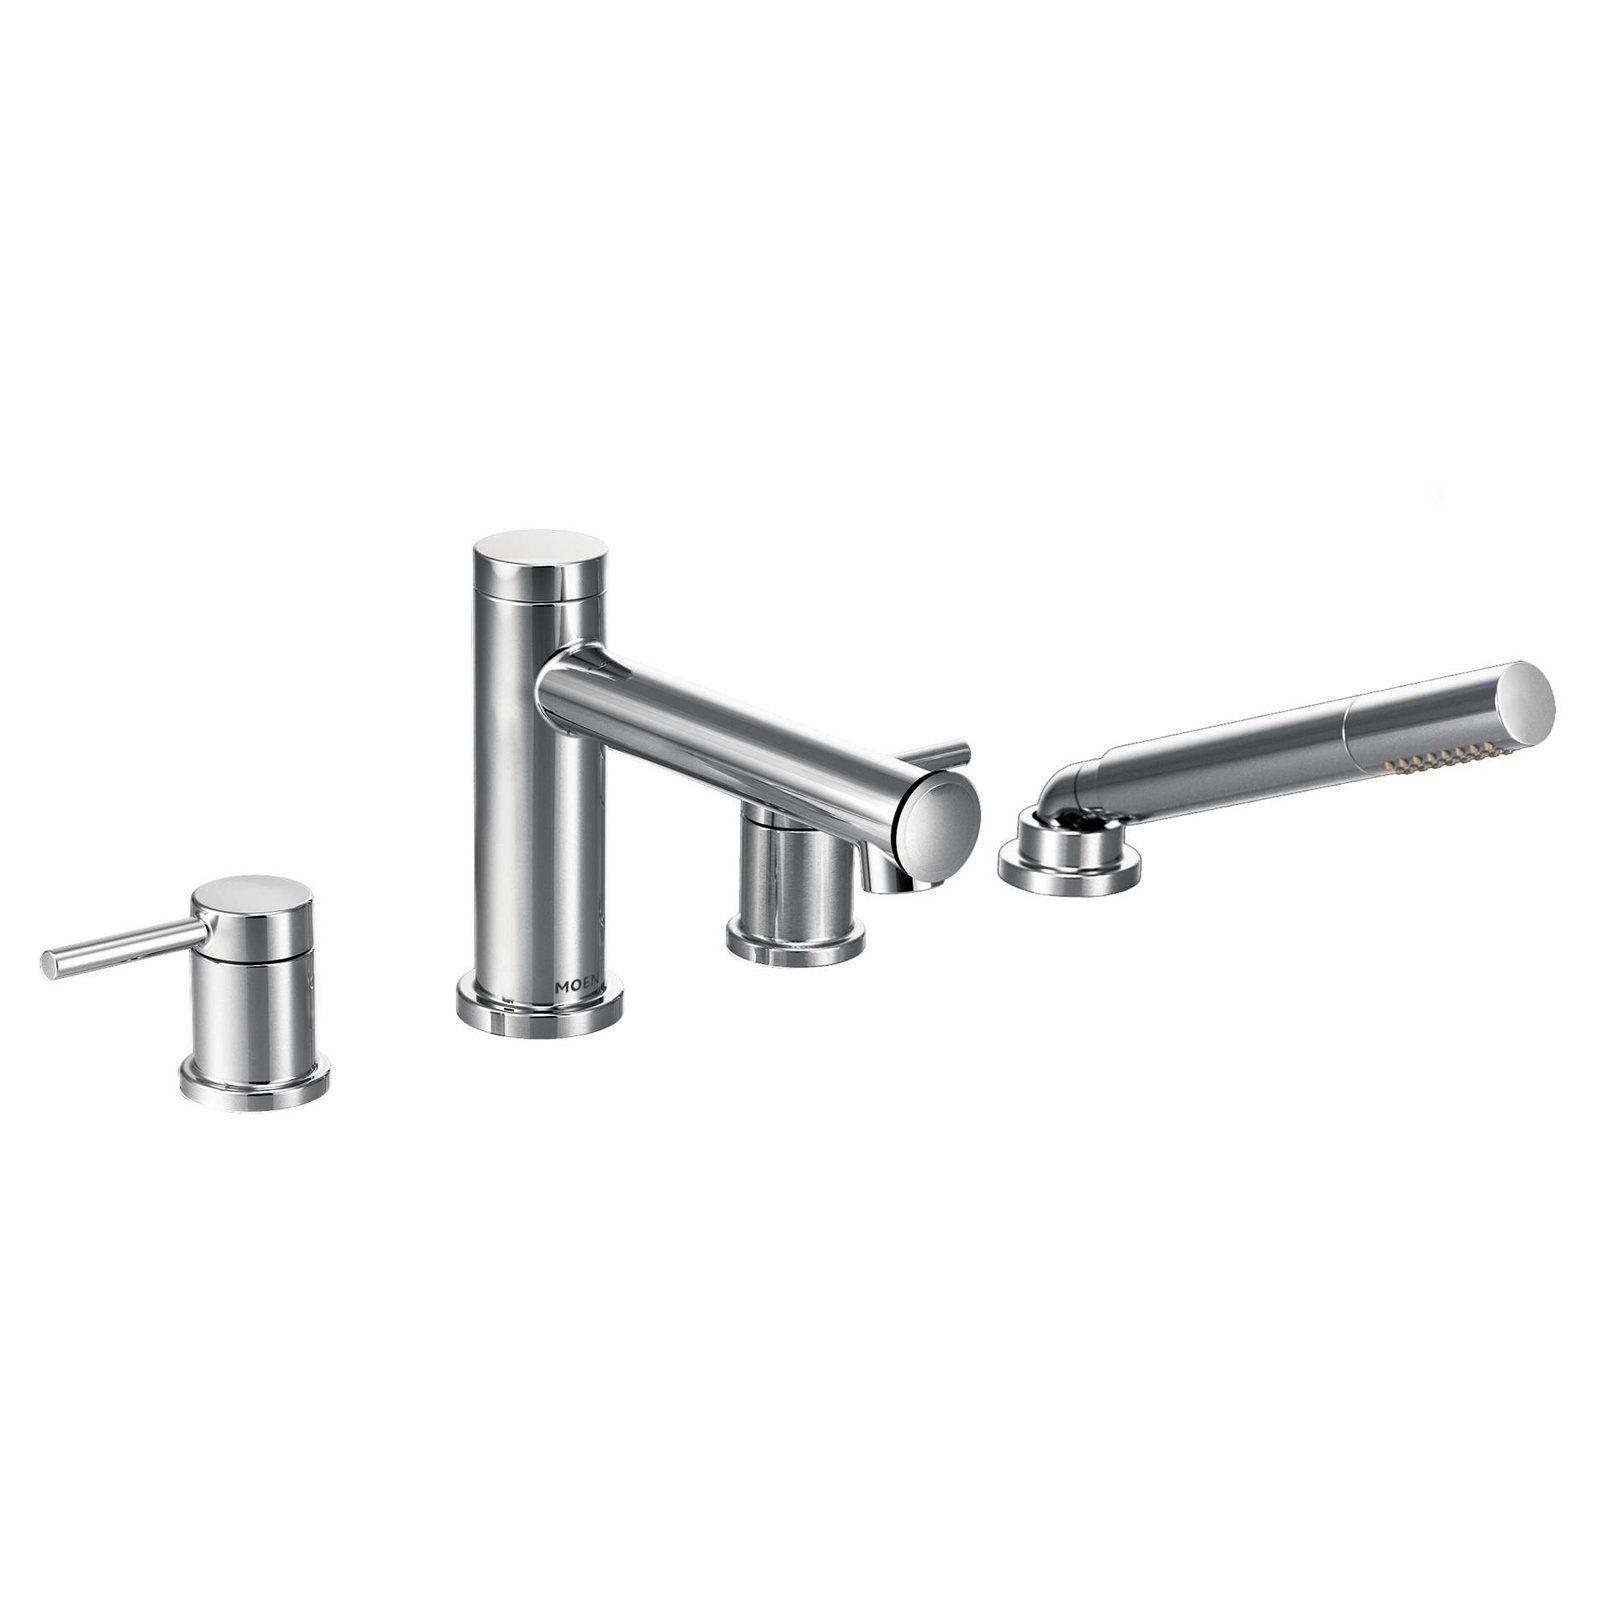 Moen Align Chrome Two-Handle Diverter Roman Tub Faucet Includes Hand ...